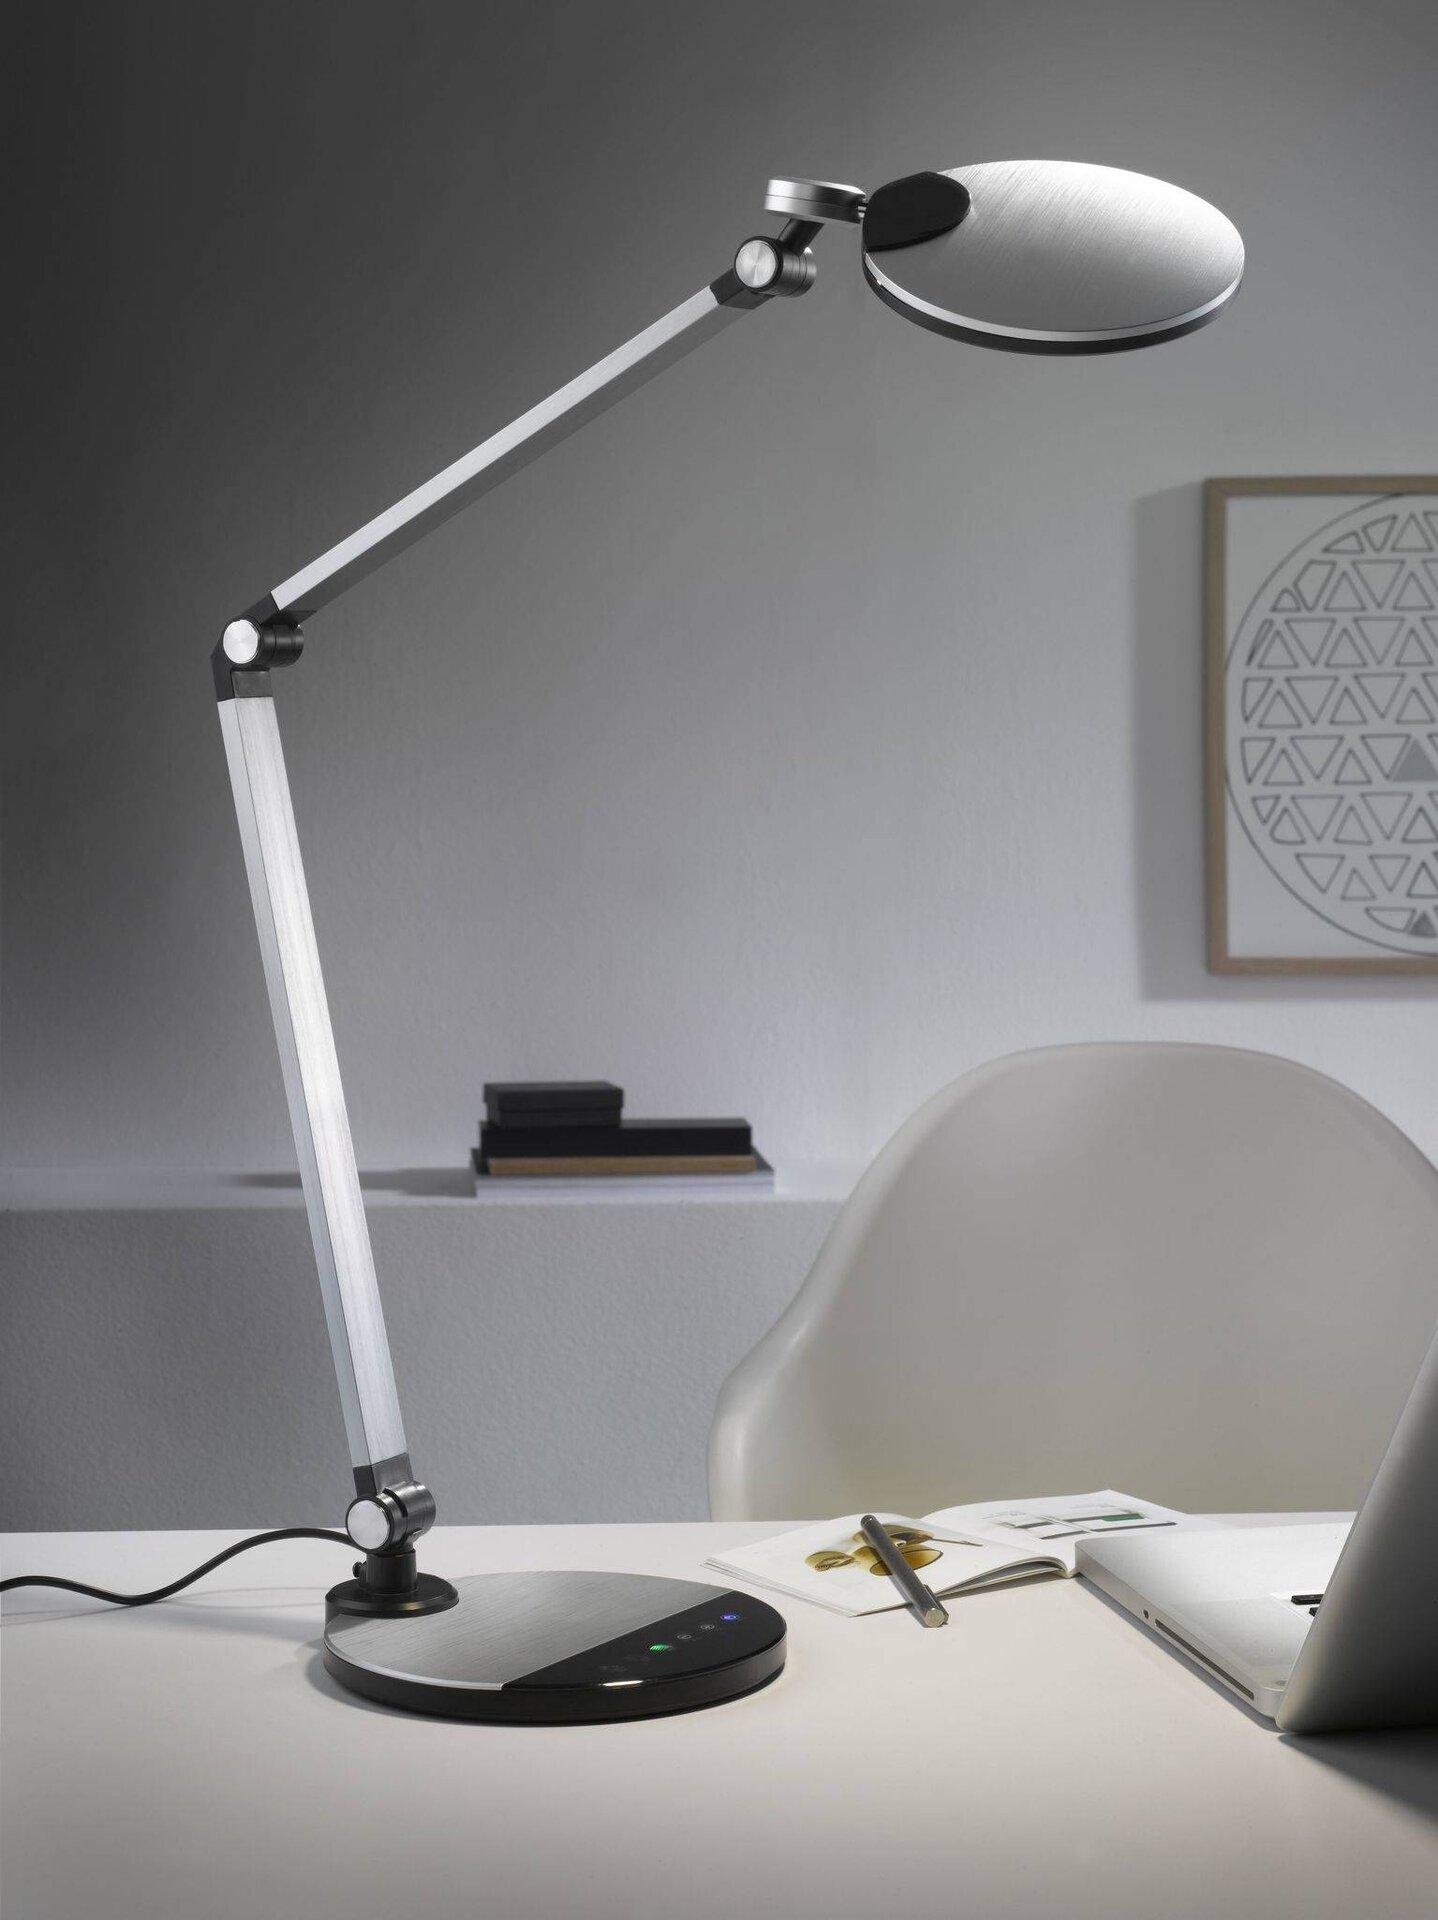 Schreibtischleuchte EXPECT  Casa Nova  Bailiwei Casa Nova Kunststoff silber 19 x 43 x 45 cm